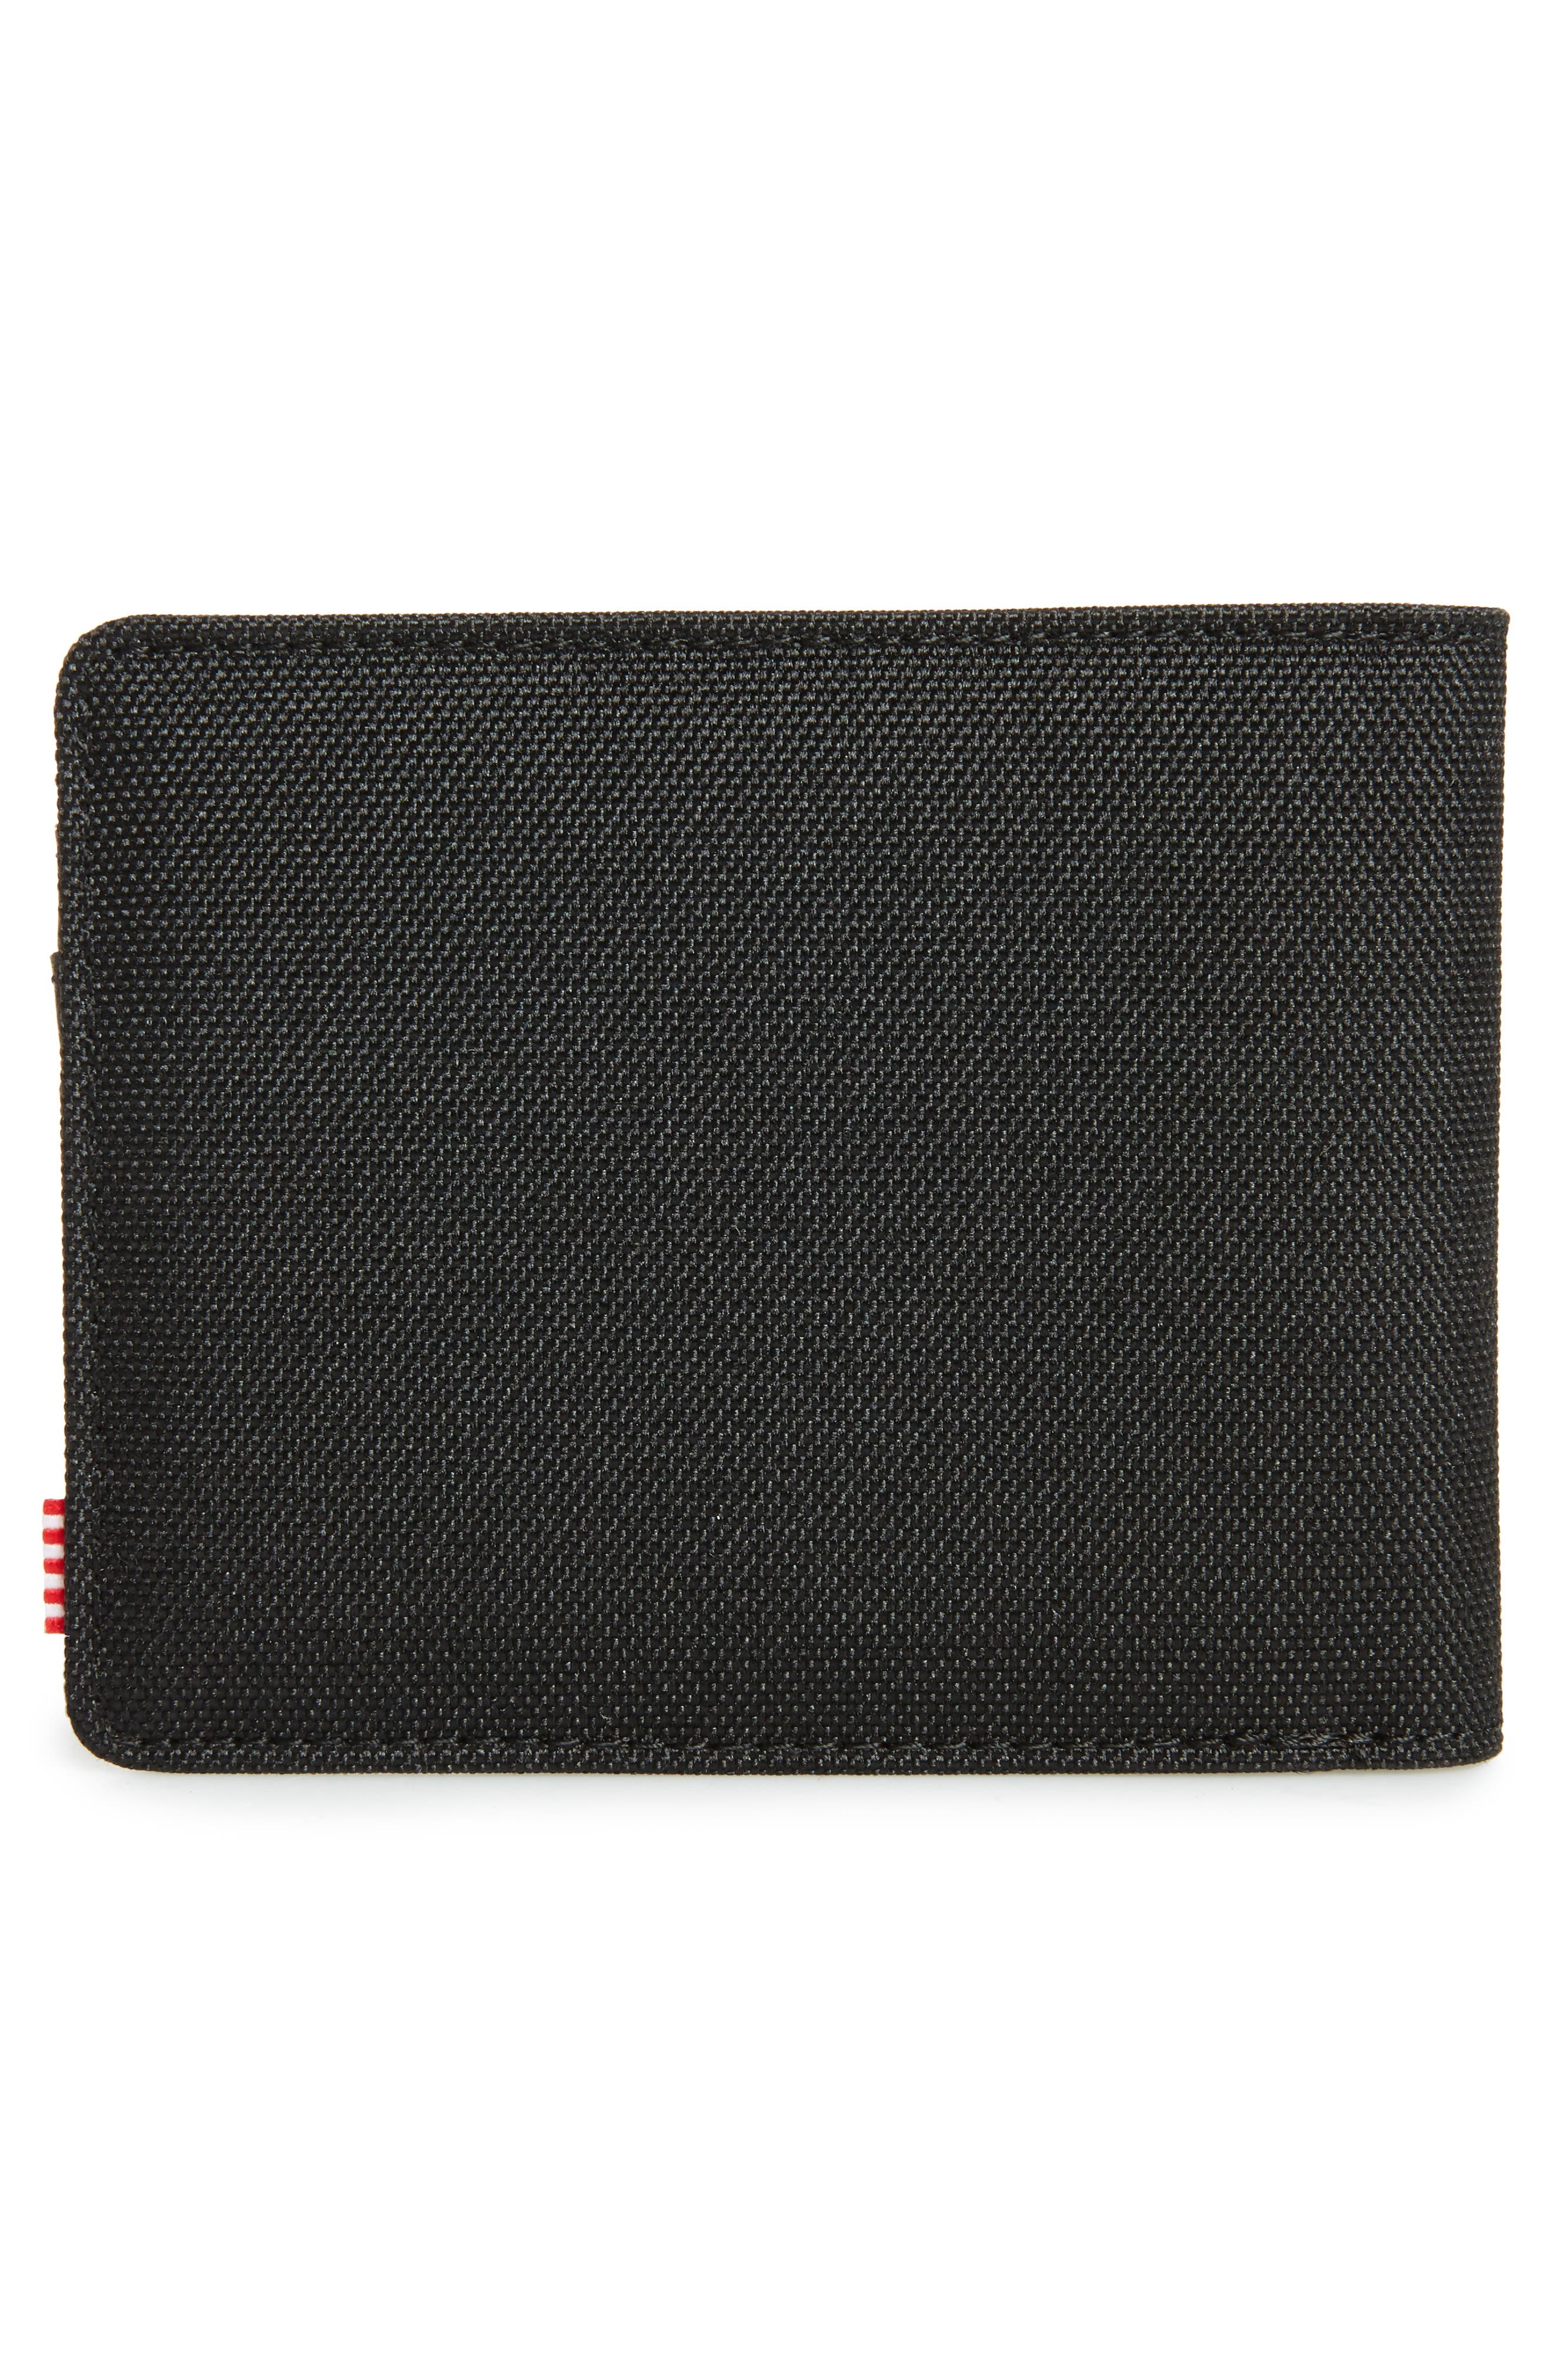 Hank RFID Bifold Wallet,                             Alternate thumbnail 3, color,                             BLACK